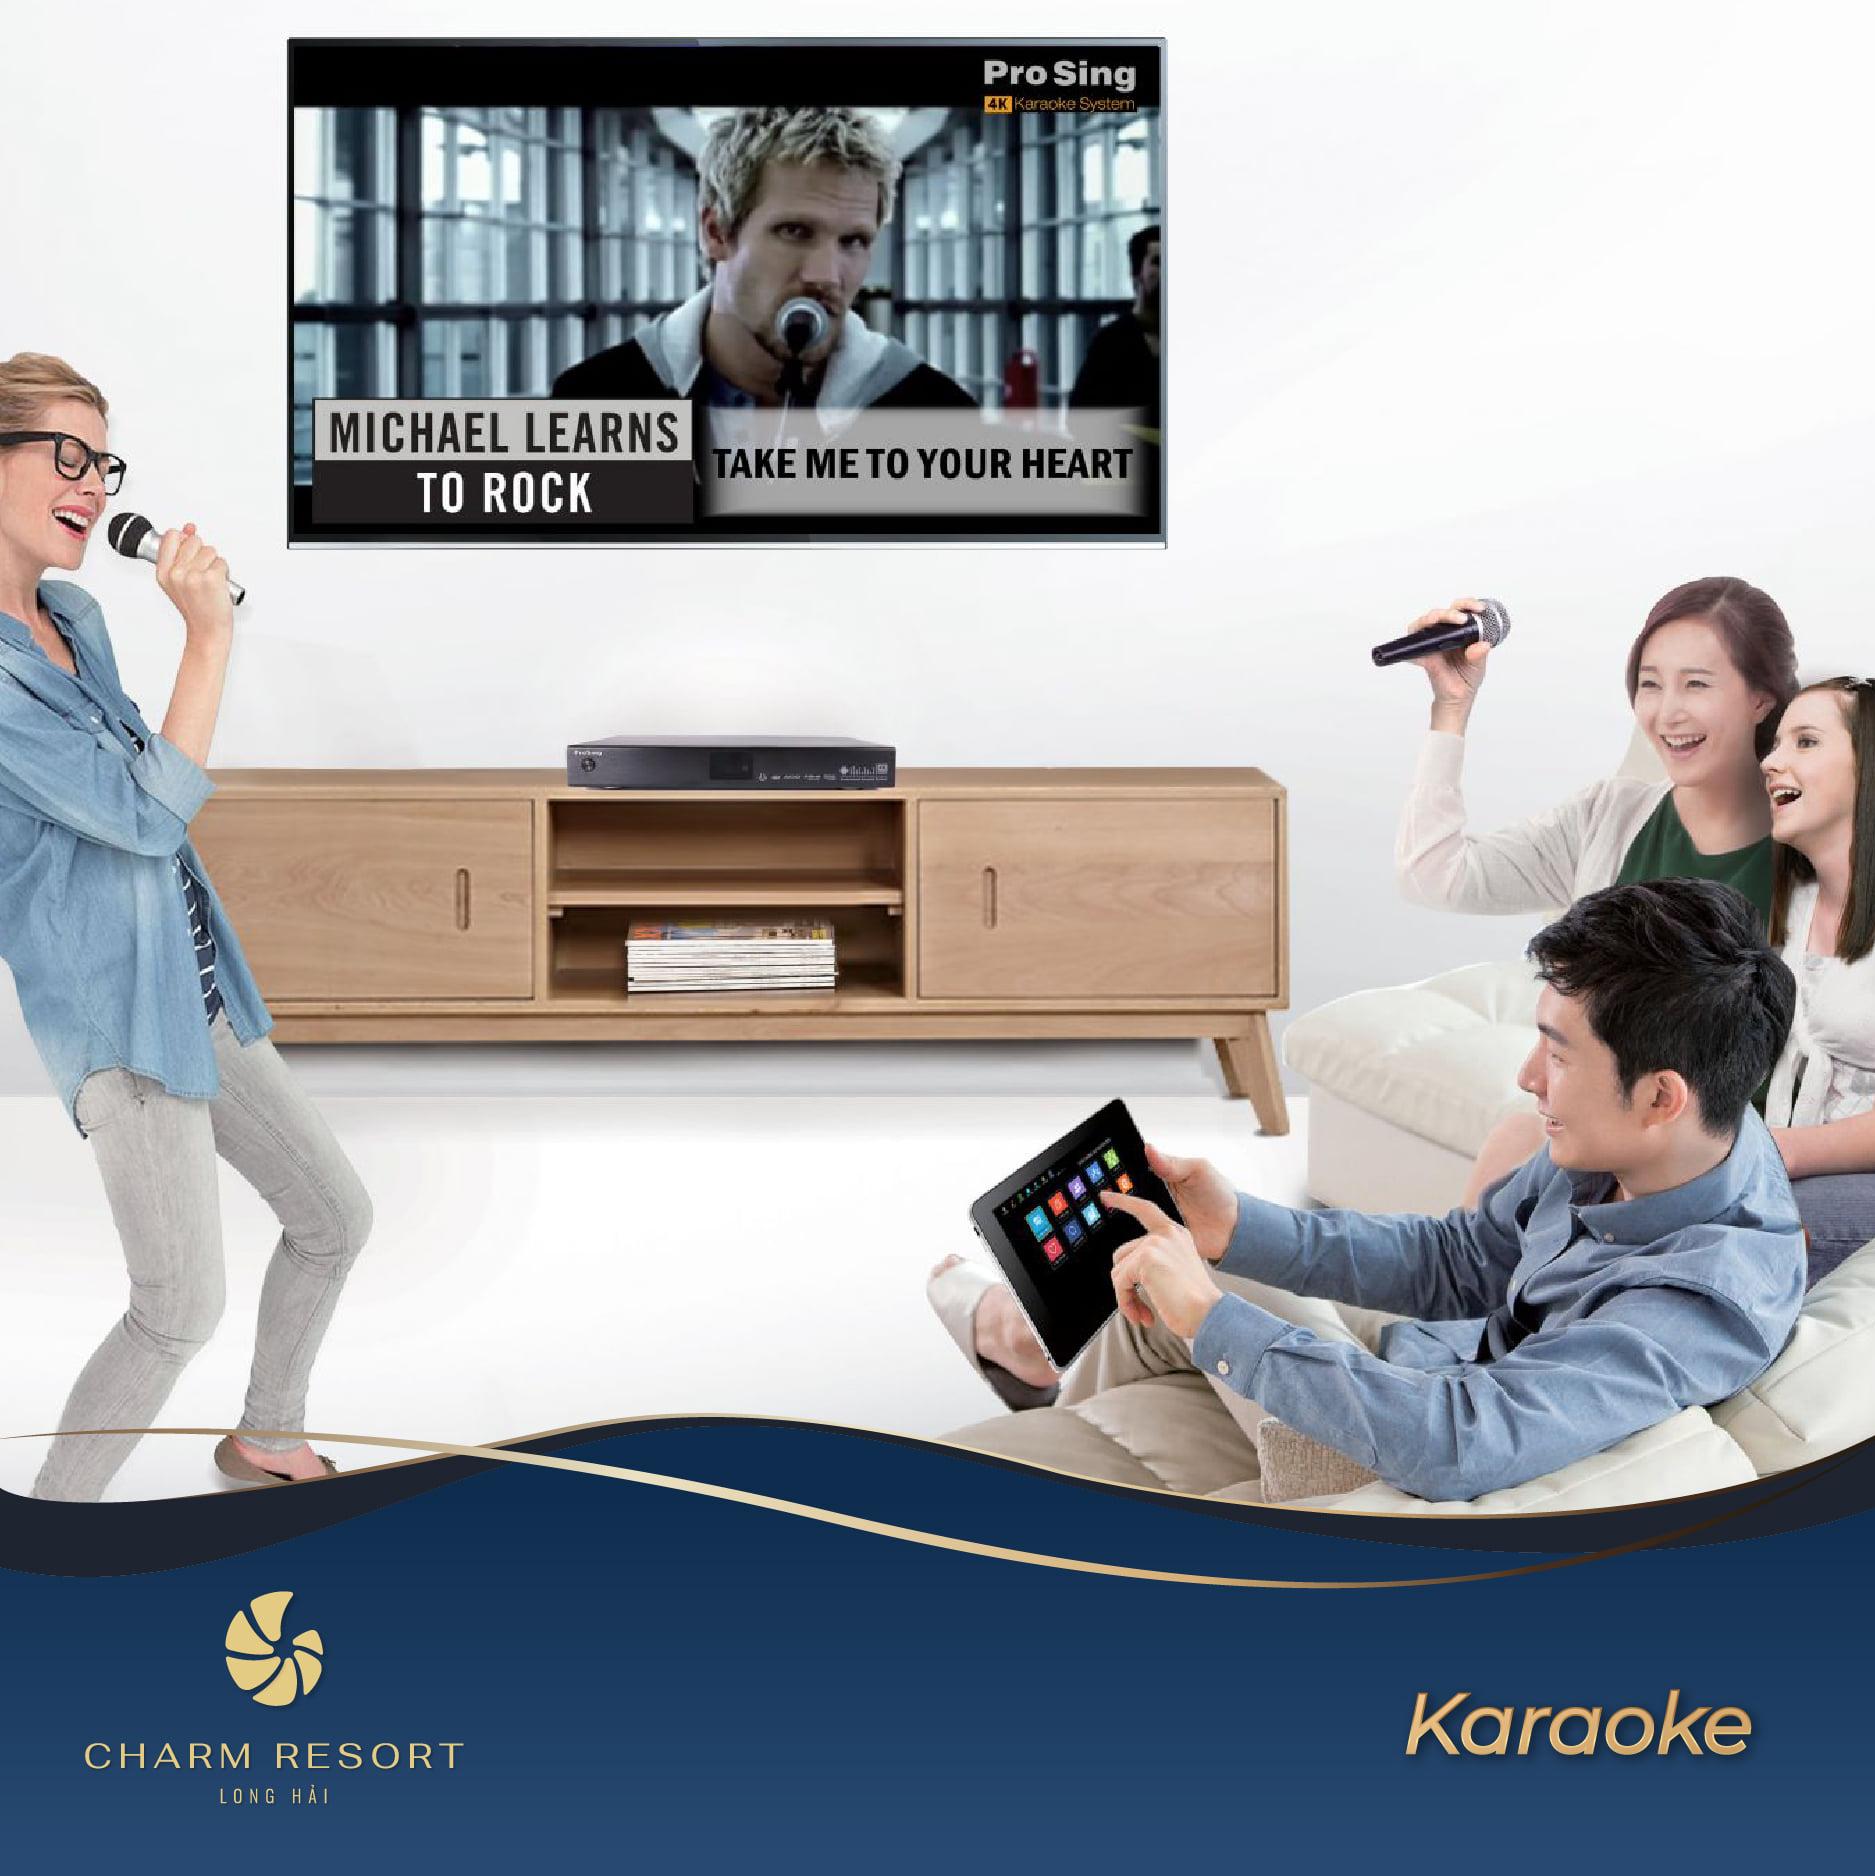 phong-karaoke-charm-resort-long-hai